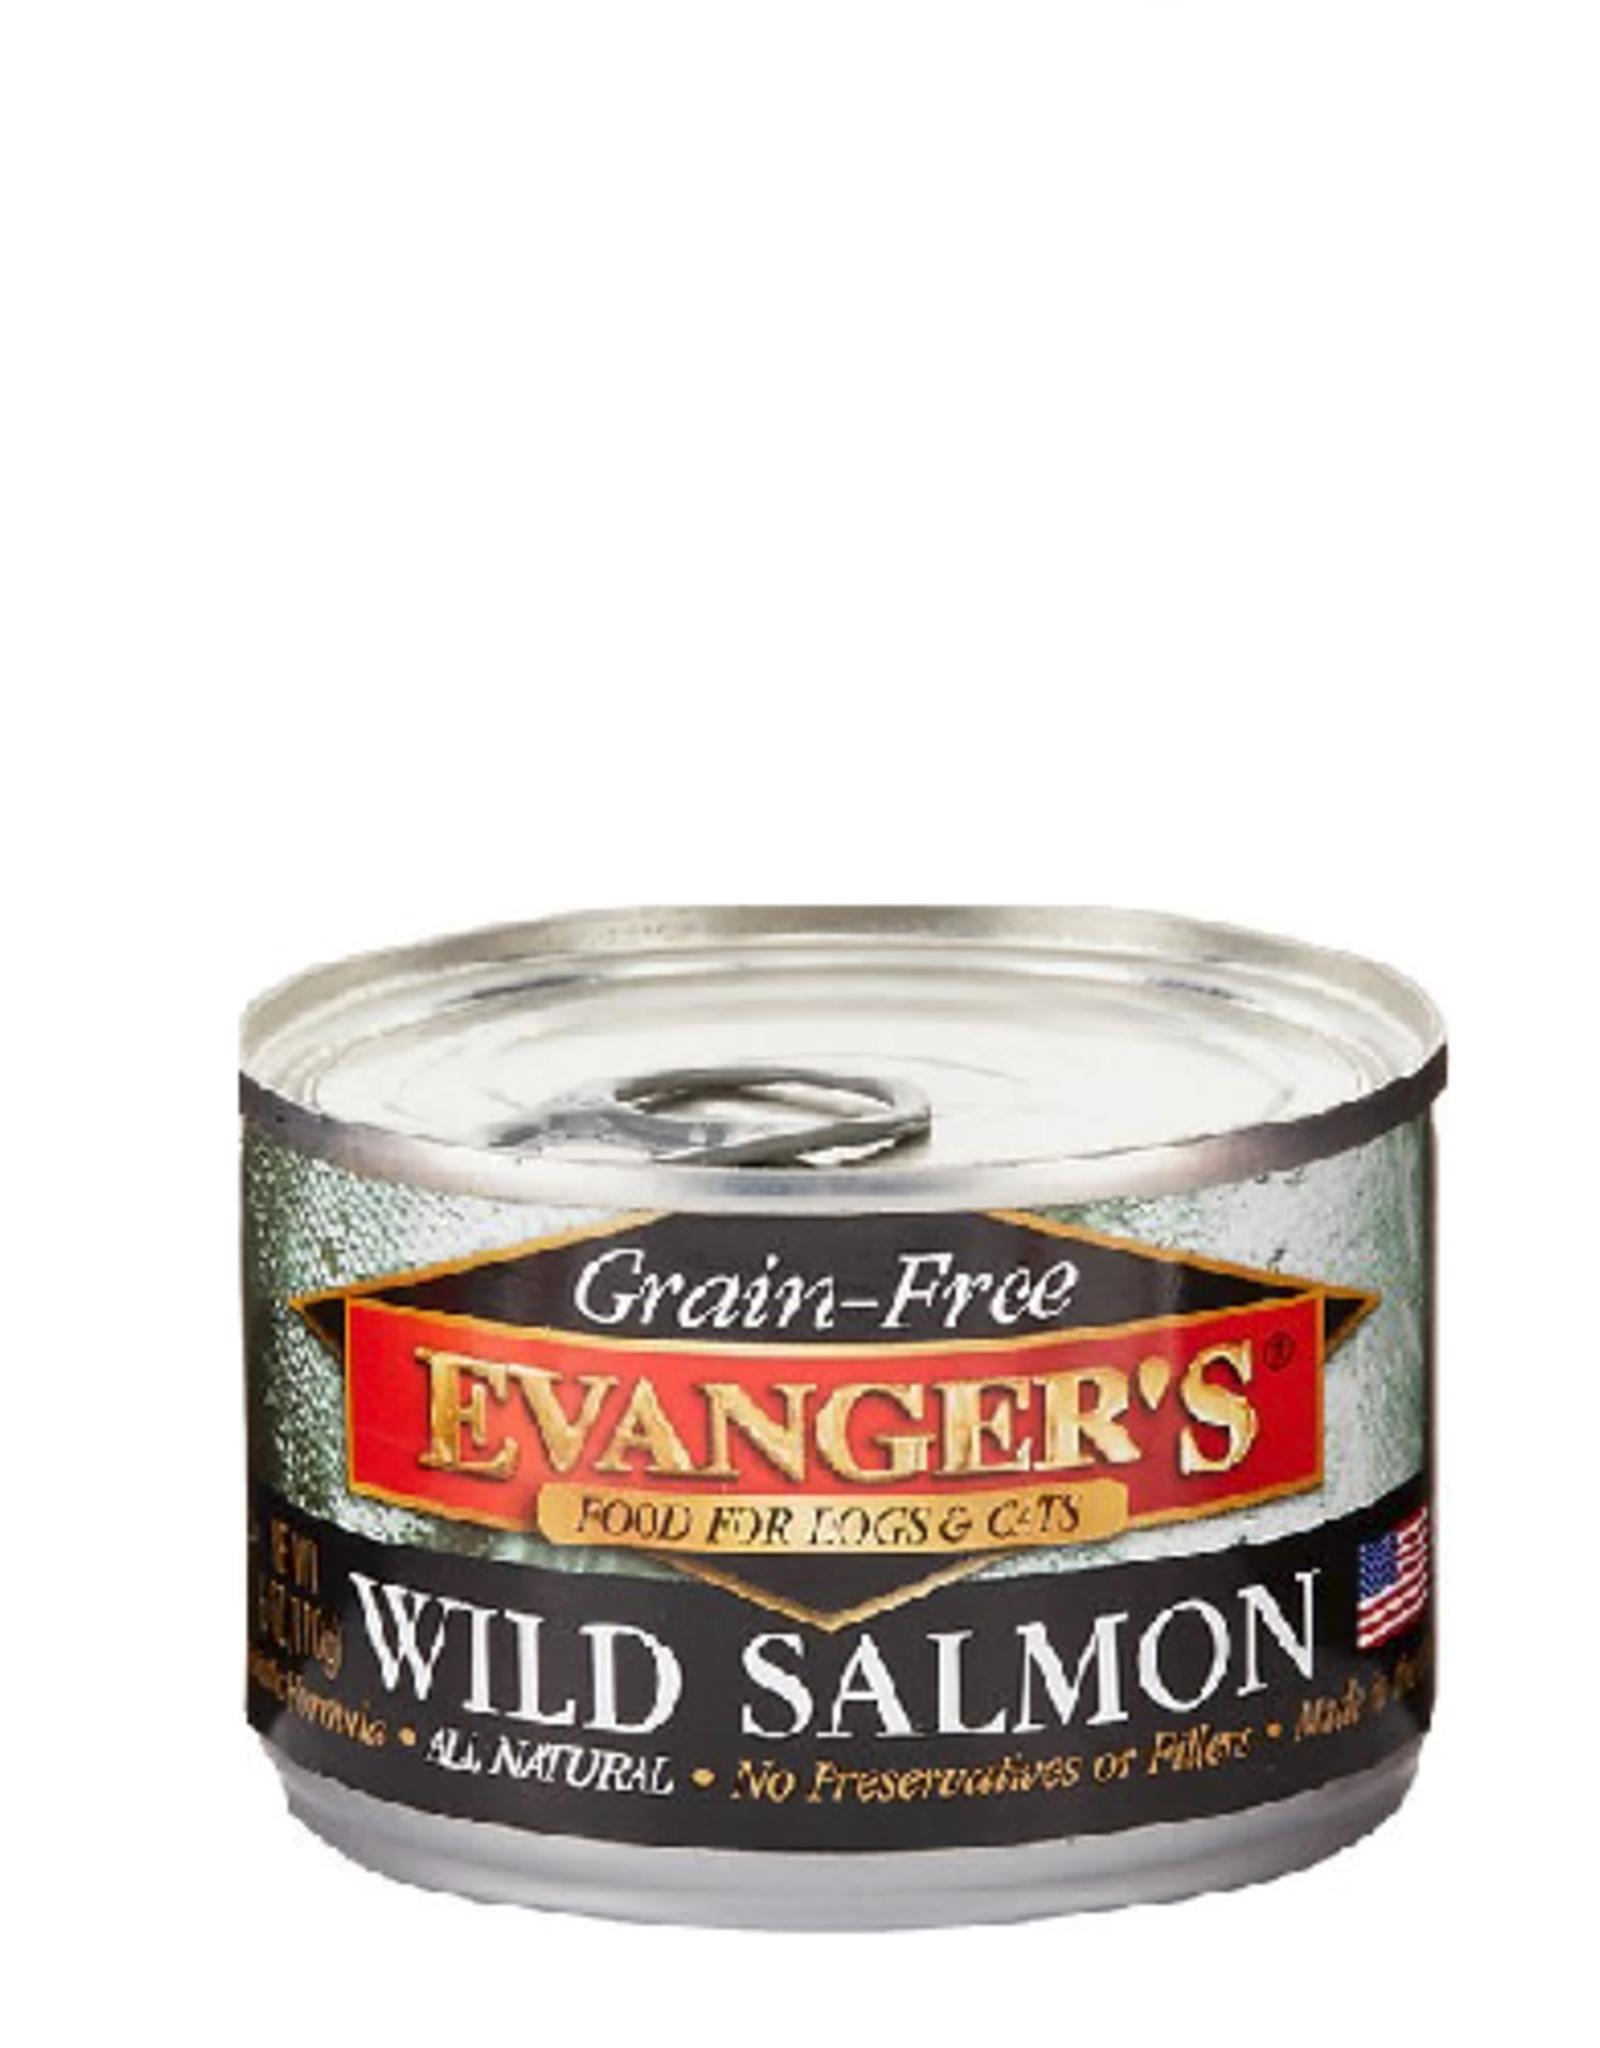 EVANGER'S EVANGERS GRAIN FREE WILD SALMON 6OZ CAN